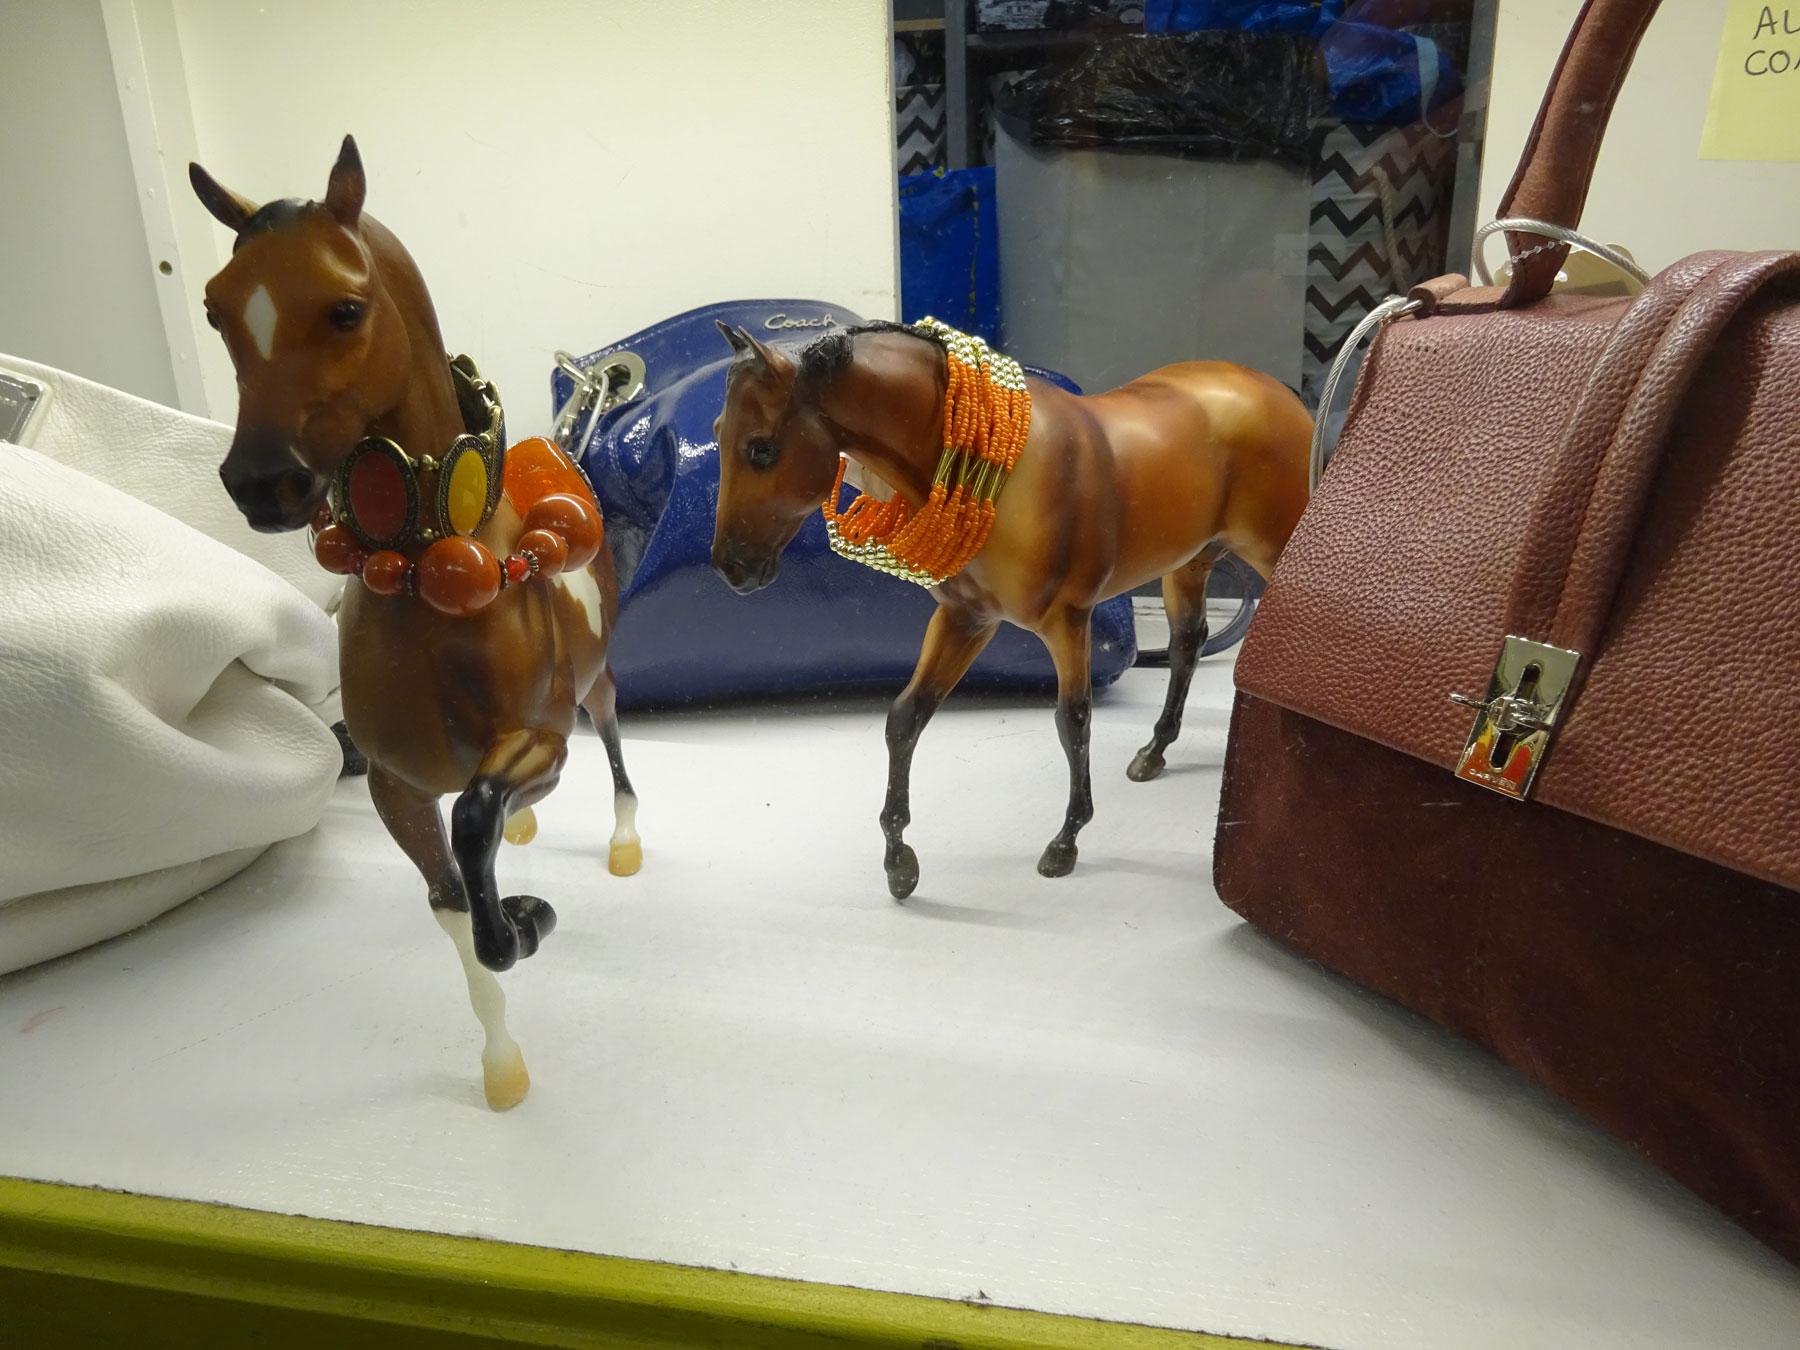 DSC00863-horses-1800x1350